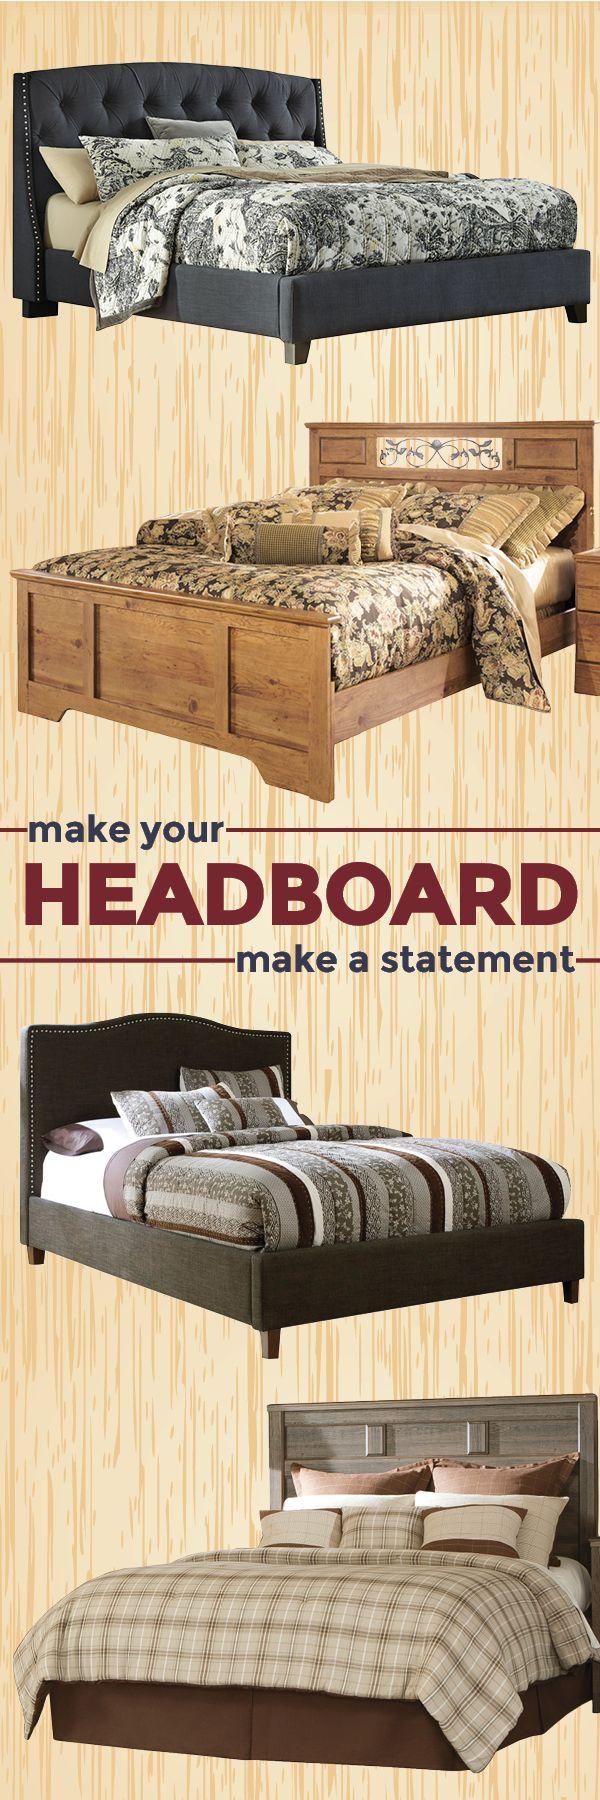 180 best dream bedroom images on pinterest